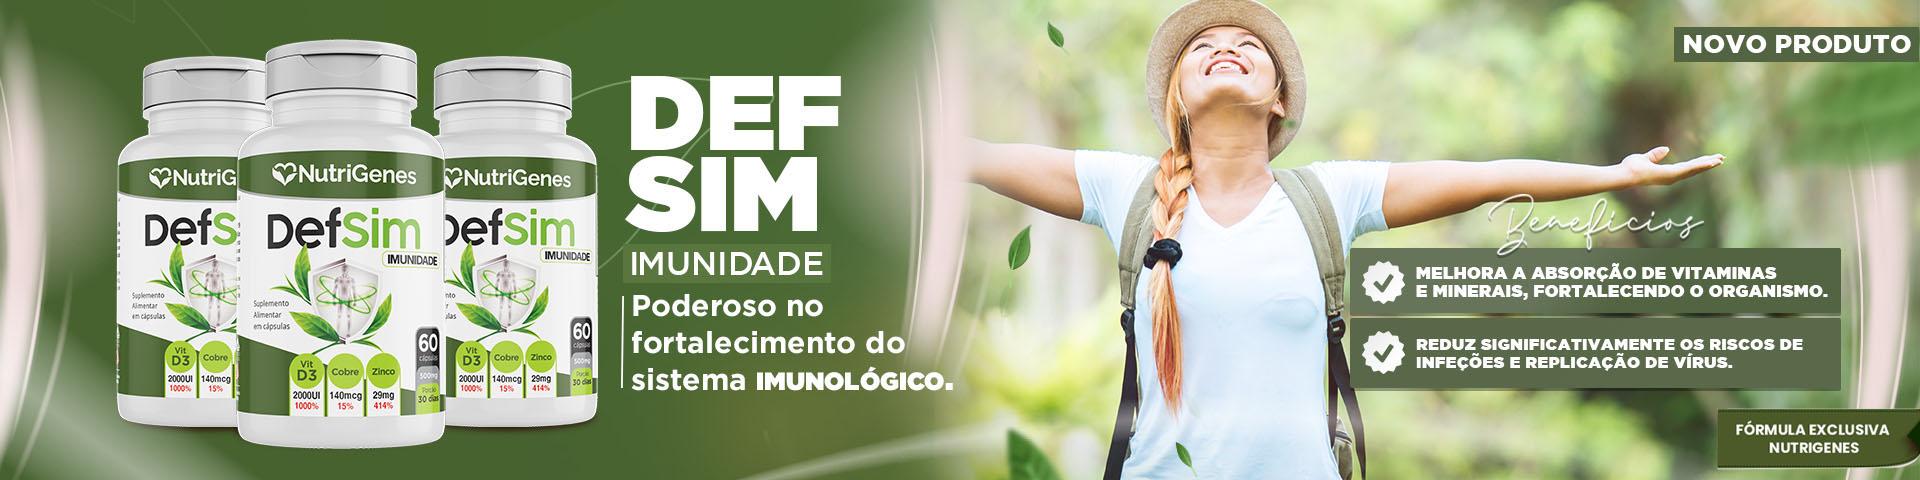 DefSim